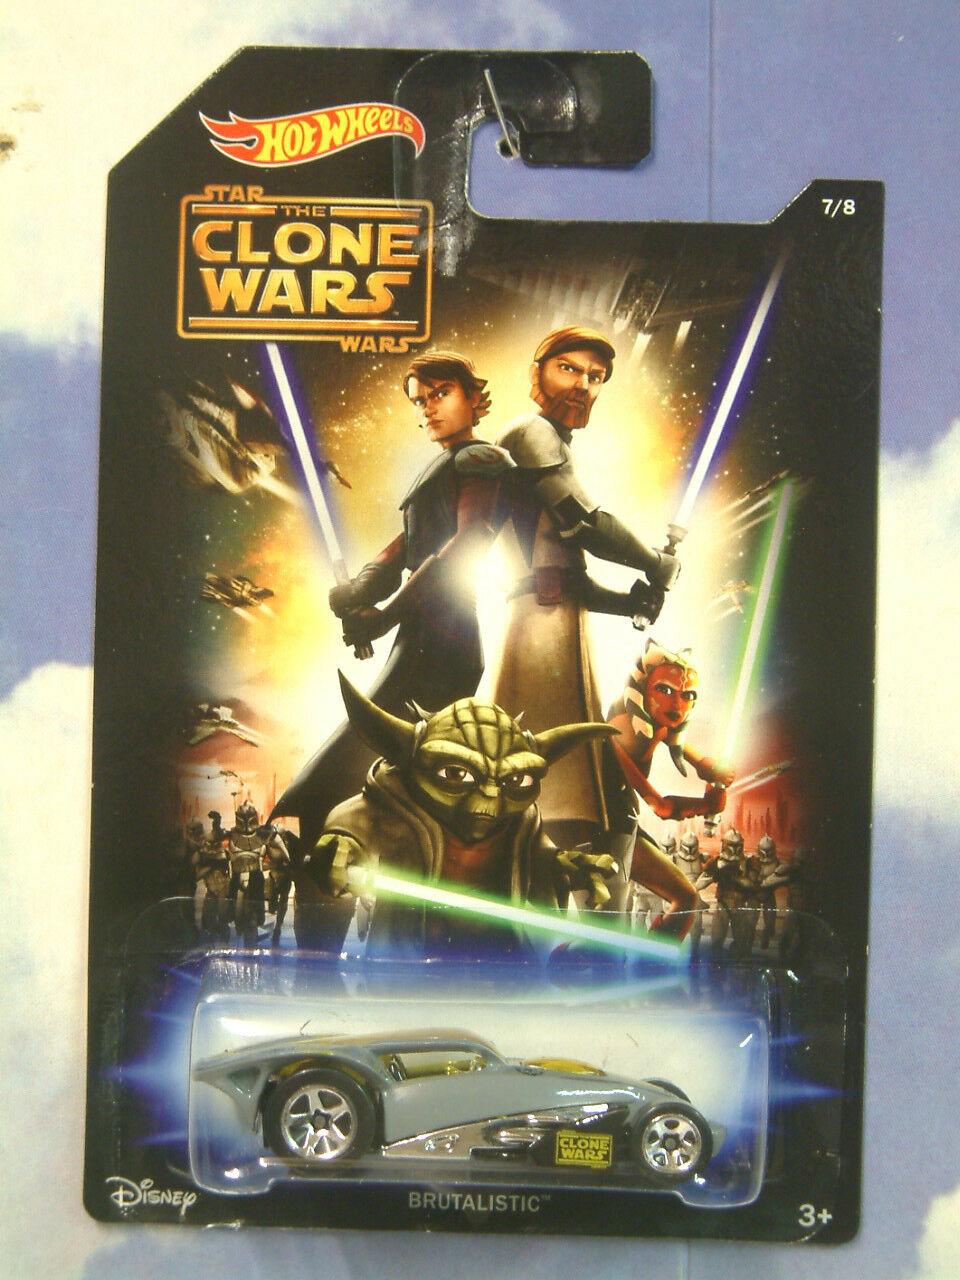 Conjunto completo completo completo de 8 Hot Wheels Coches de inspiración Star Wars Episodios 1-6 Clone Wars rebeldes 354e7a